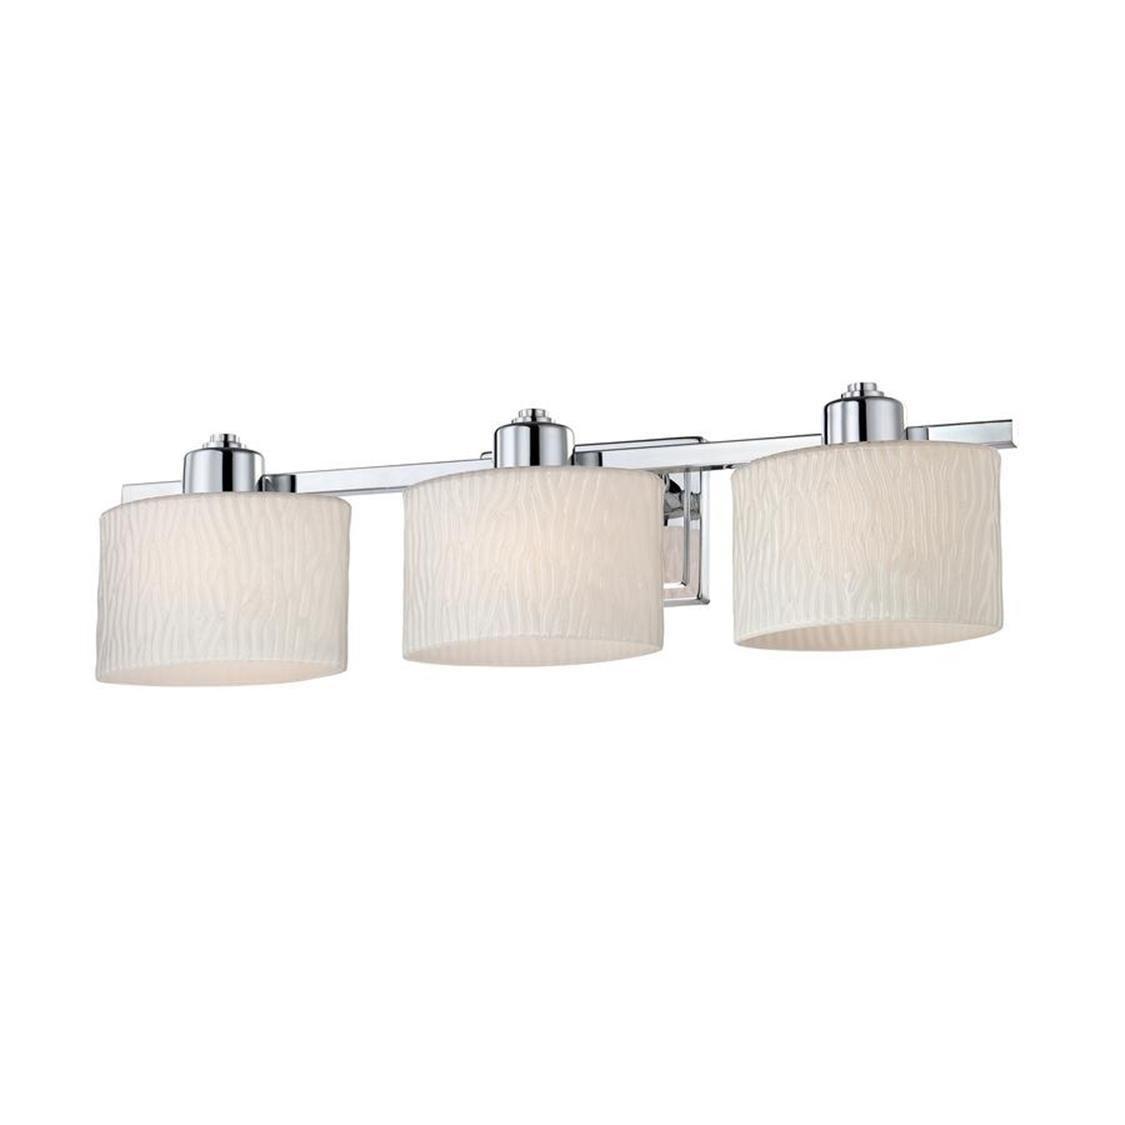 36 inexpensive farmhouse bathroom light fixtures ideas